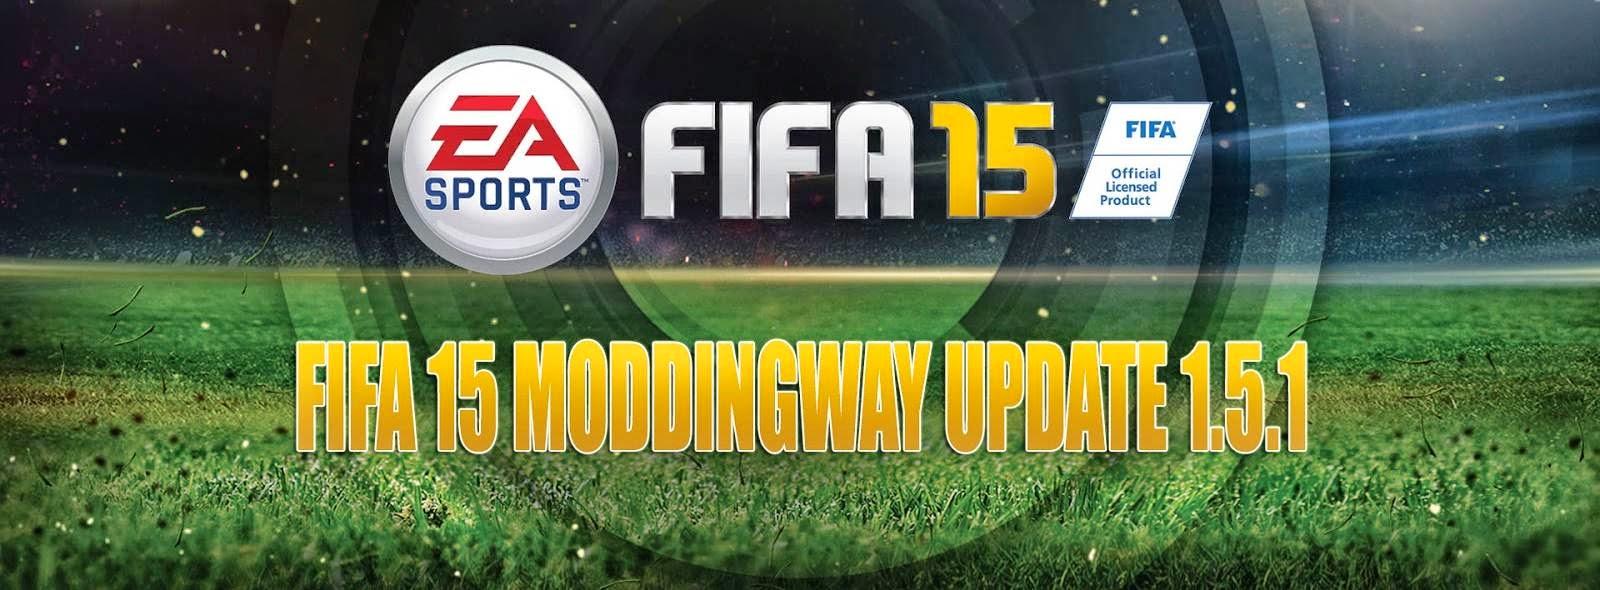 FIFA 15 + UPDATE 4 + krack V2 + MODDINGWAY 1 5 1 ~ ID System